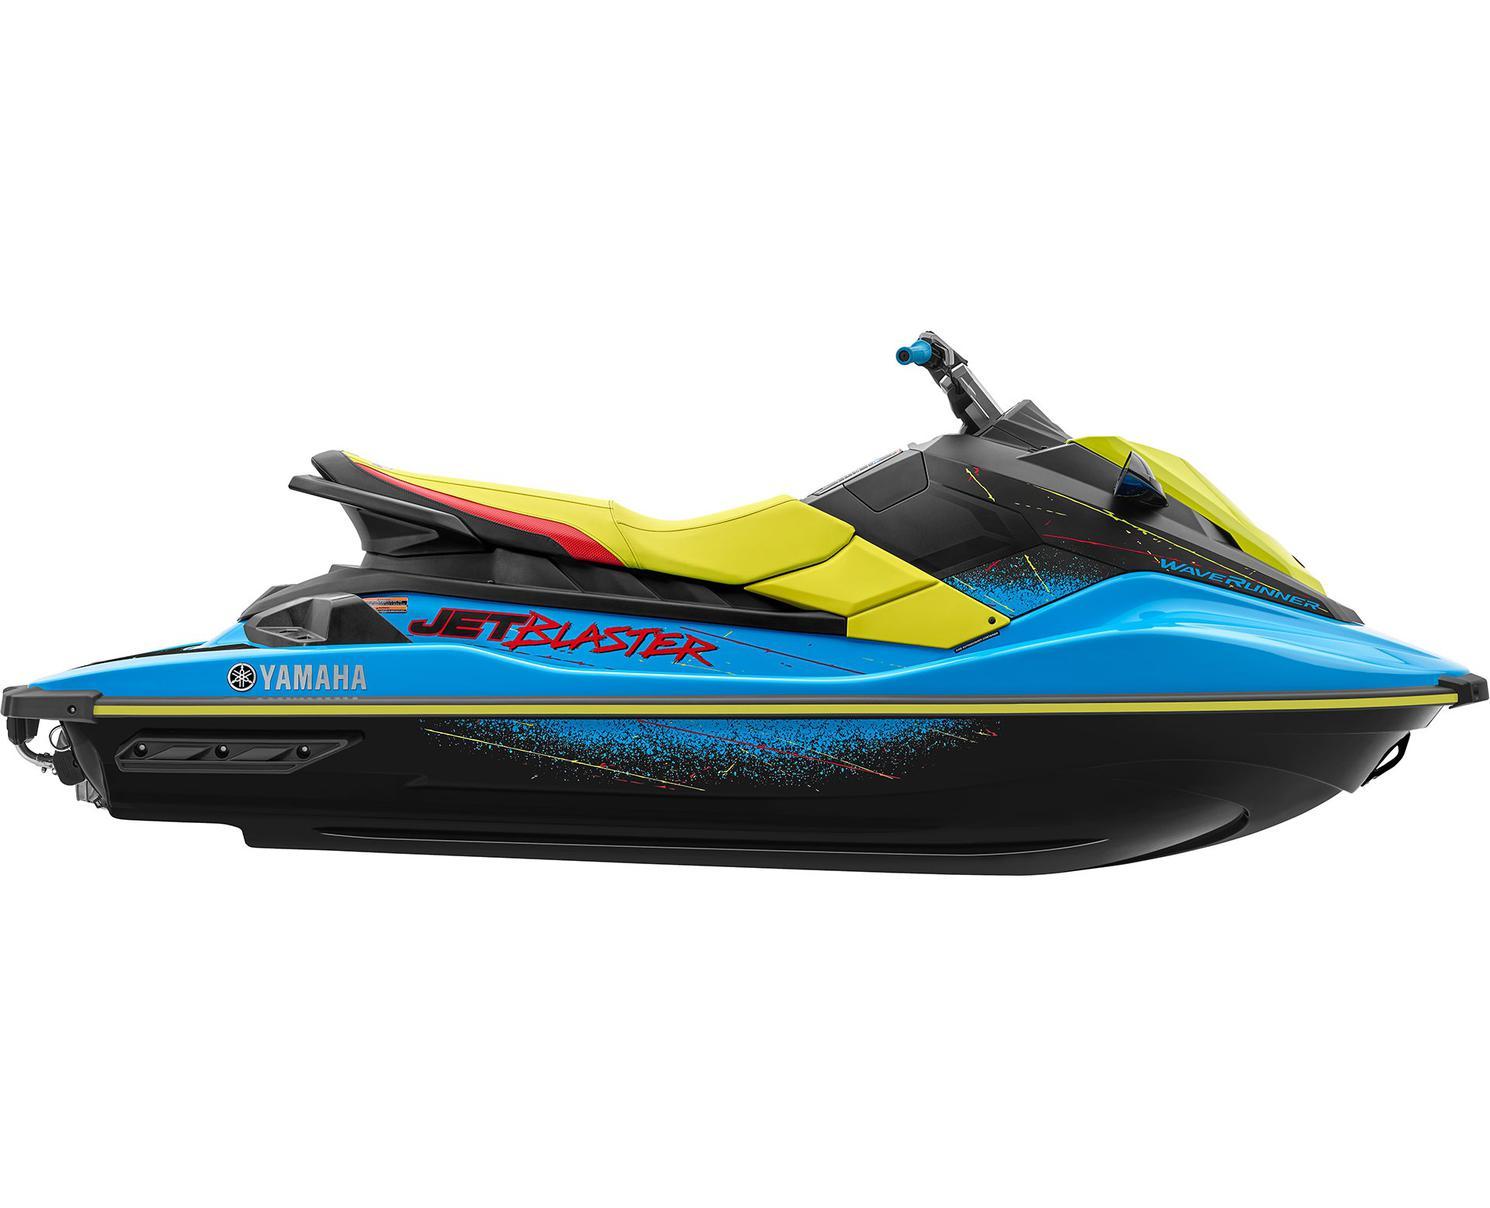 2022 Yamaha Jet Blaster Cyan/Lime Yellow